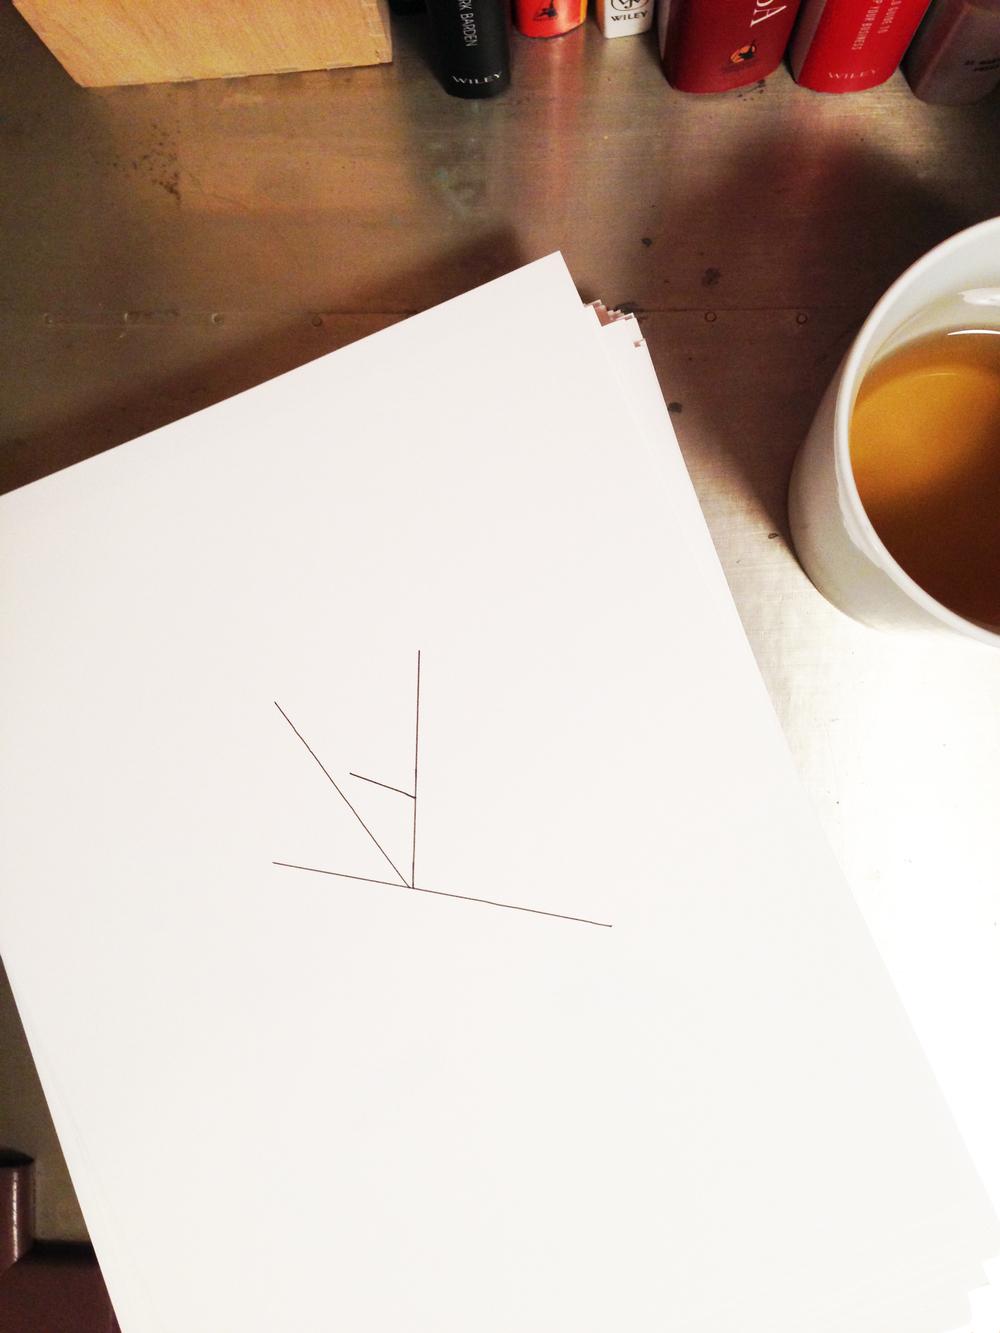 straight_line_7.jpg